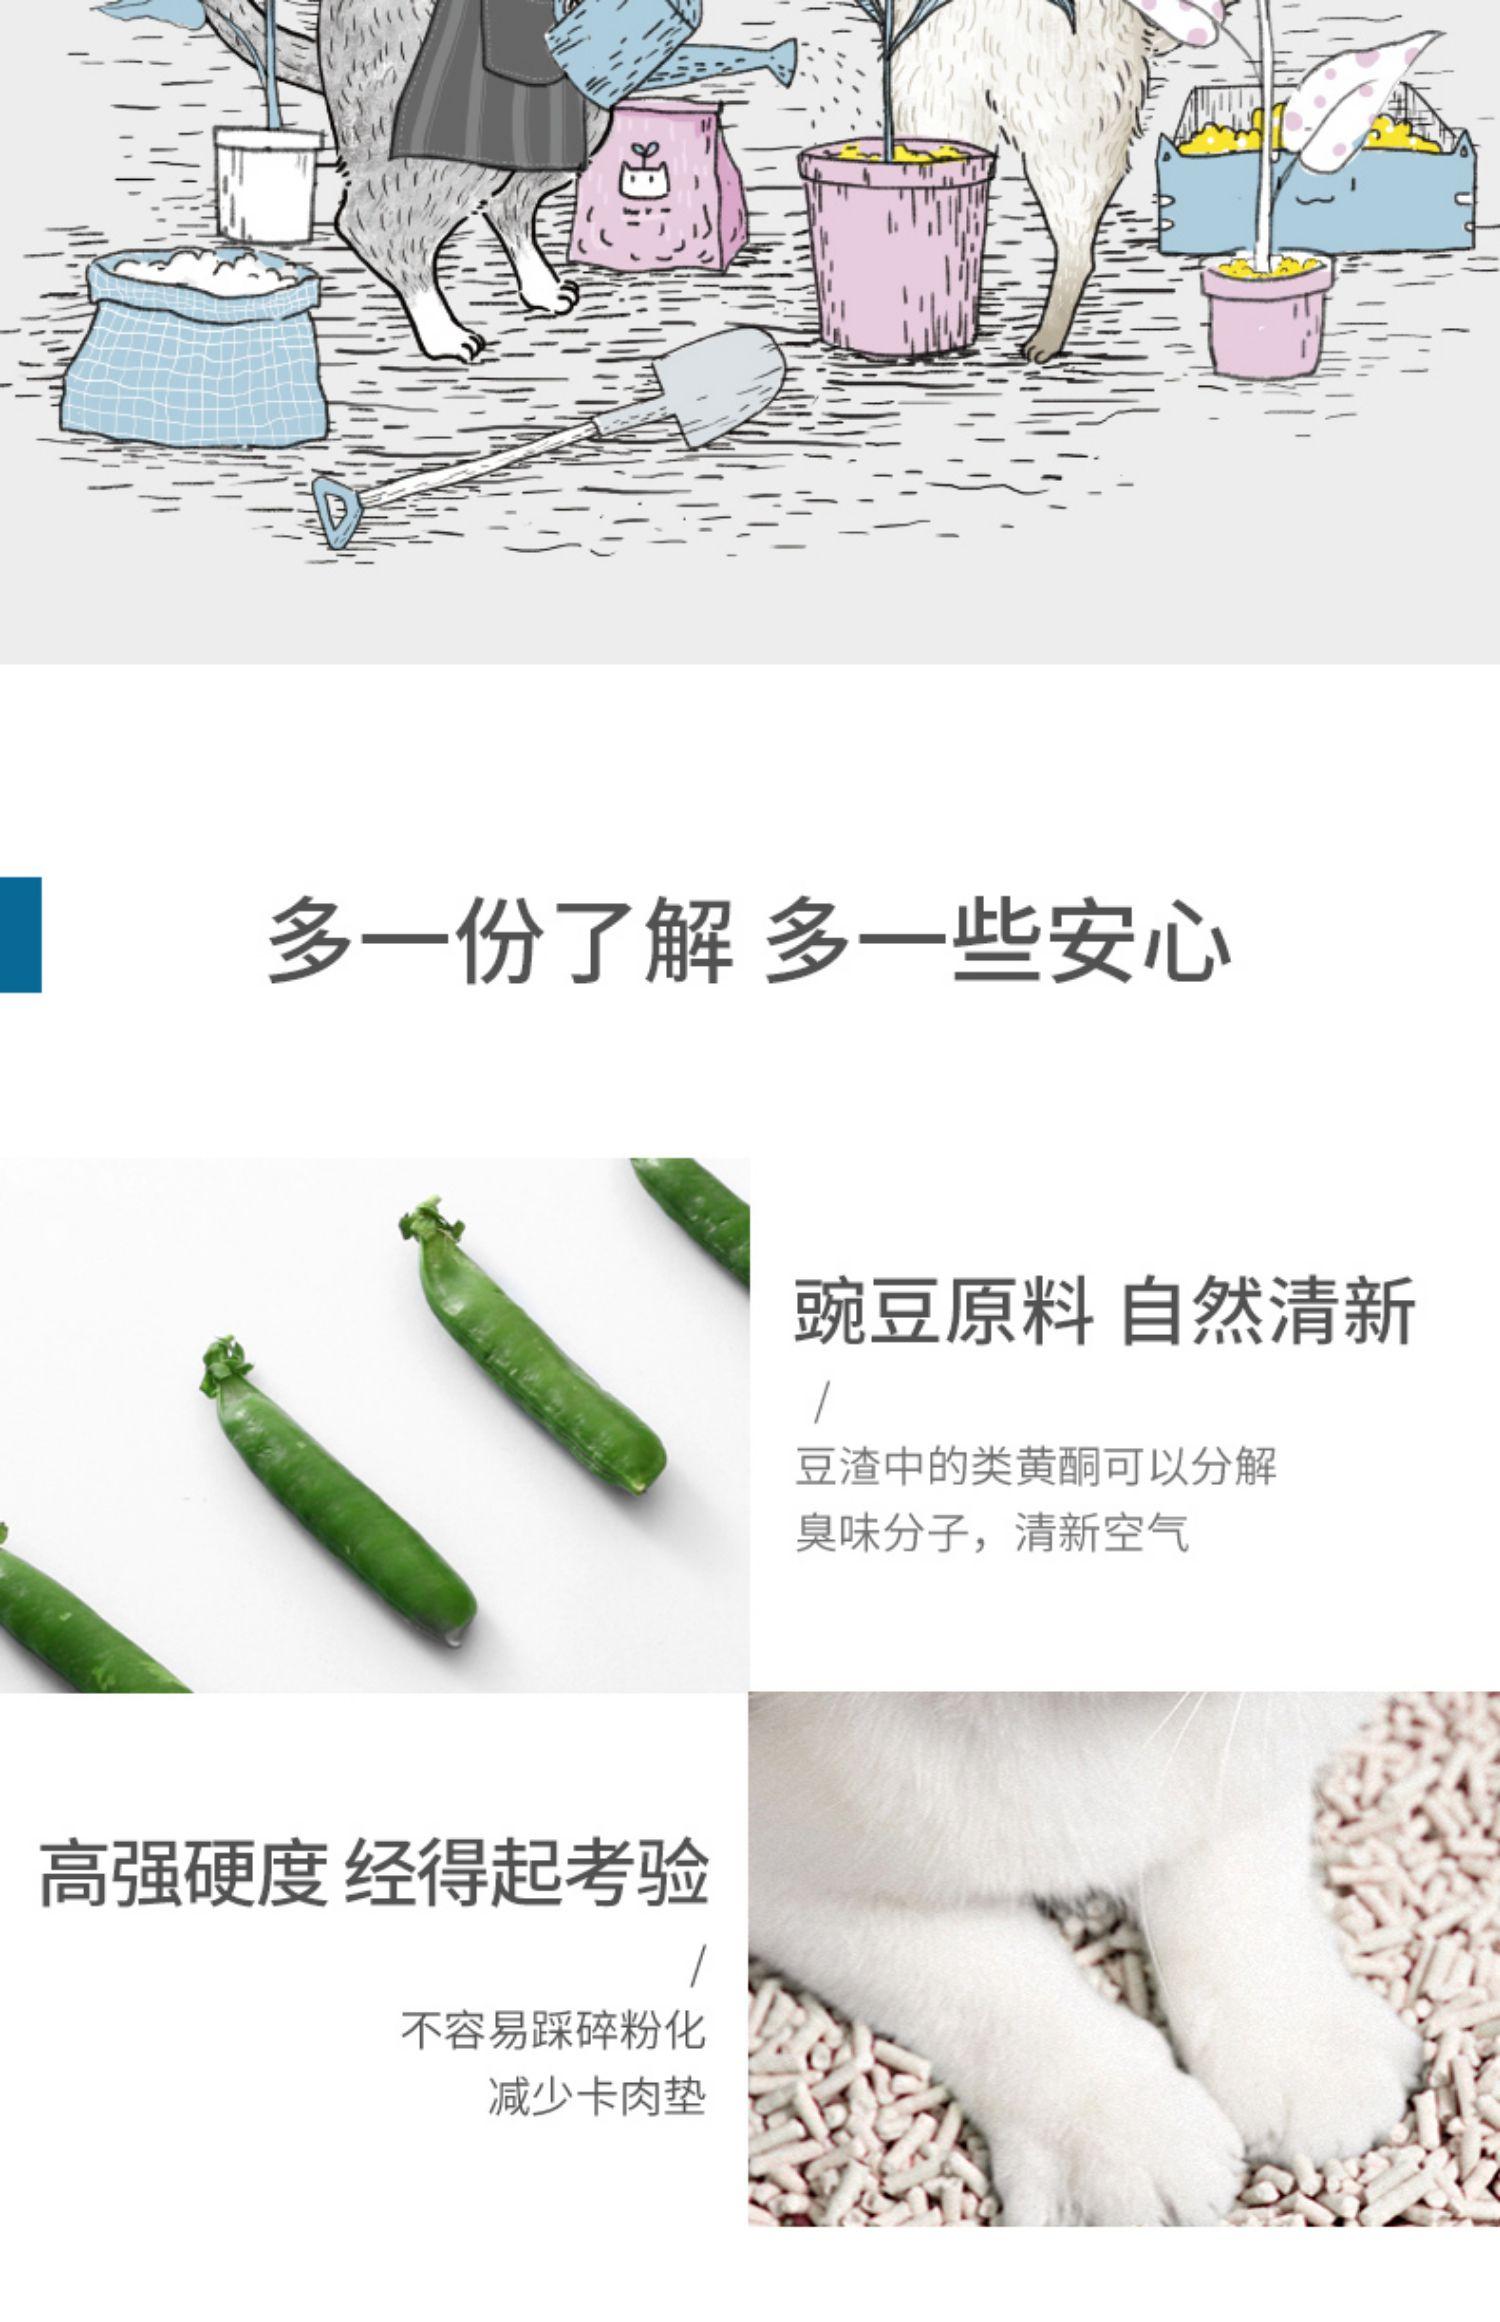 drymax洁客豆腐膨润土混合*无粉尘